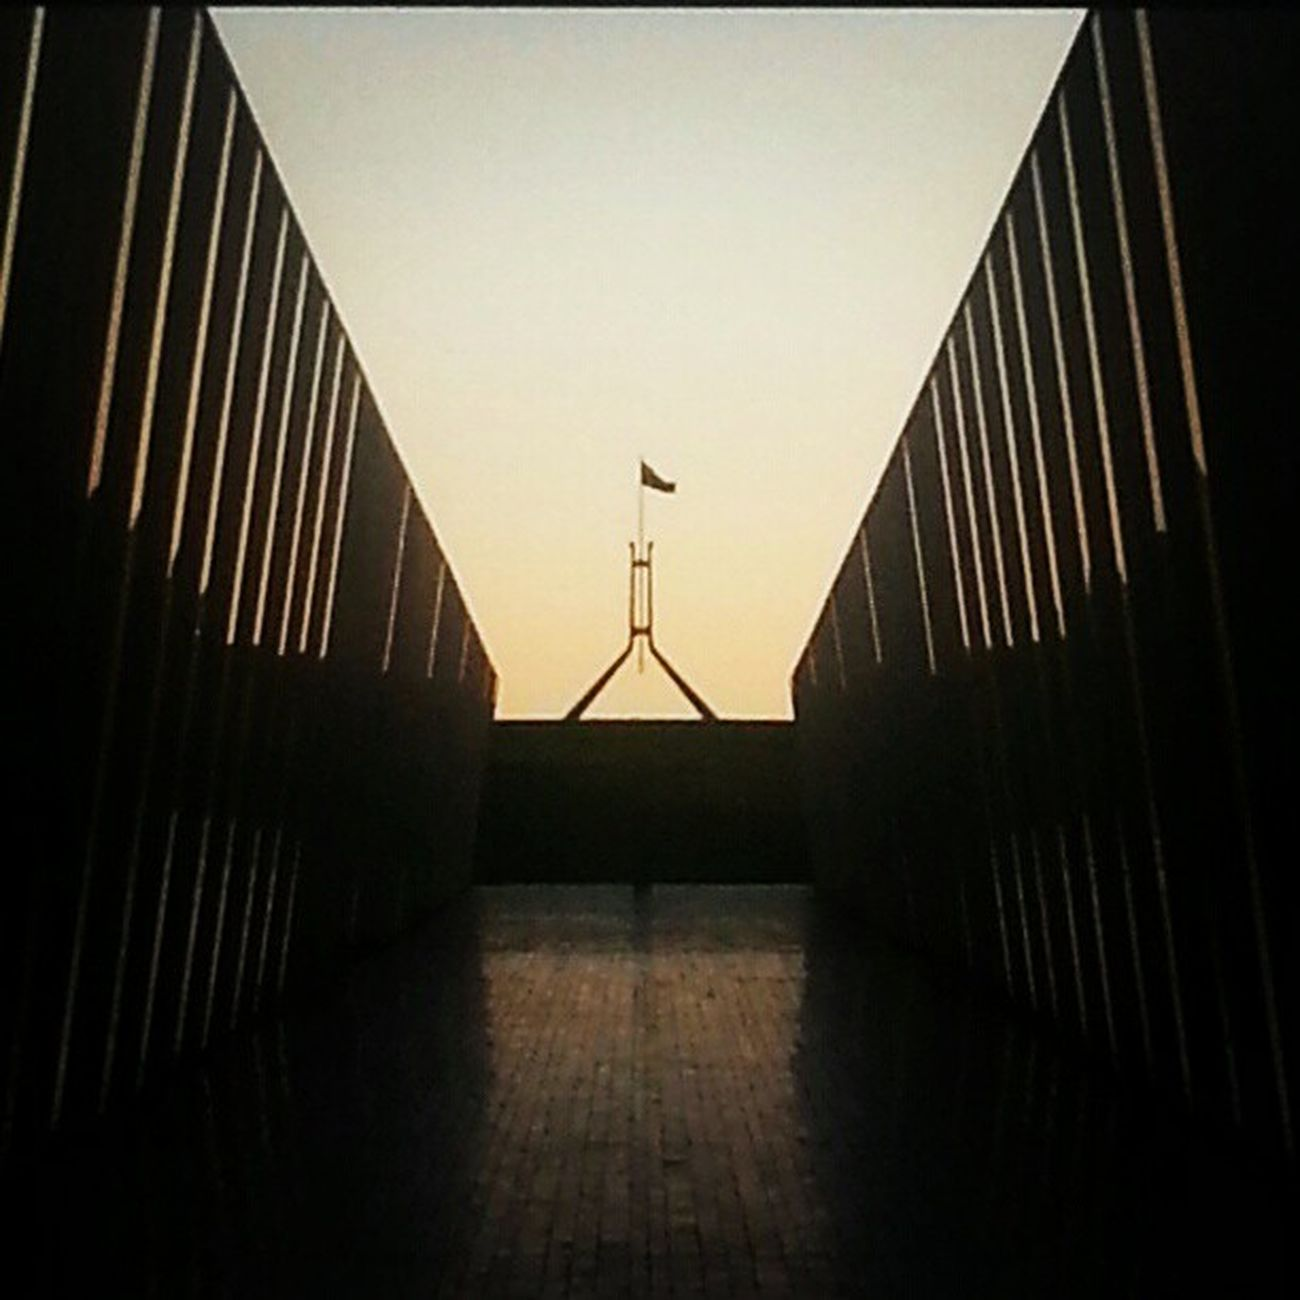 Parliment Parliamenthouse Commonwealthplace Commonwealth retro disco lights australia canberra flag australianflag burleygriffin dusk sunset reflection summer blueskies sky skyporn summerporn